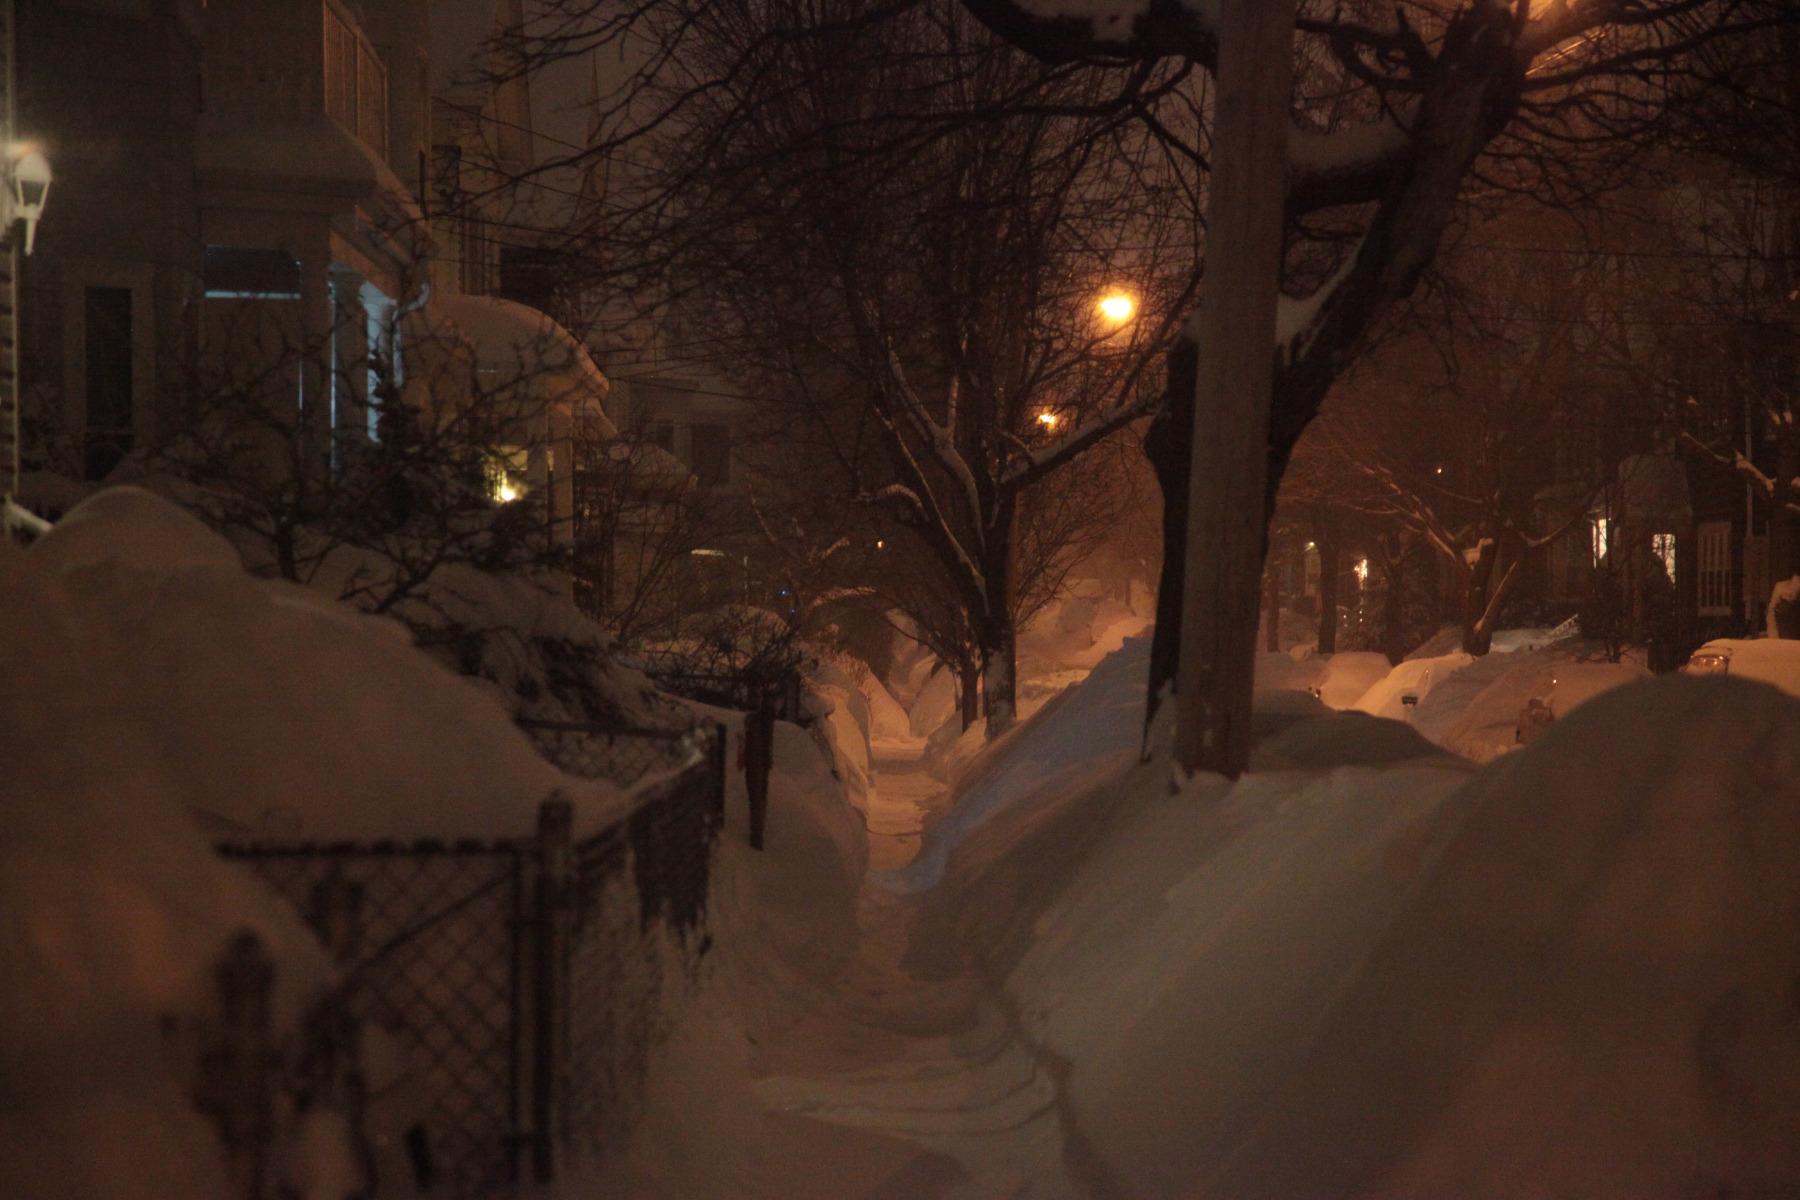 Irving Street, Somerville night snow